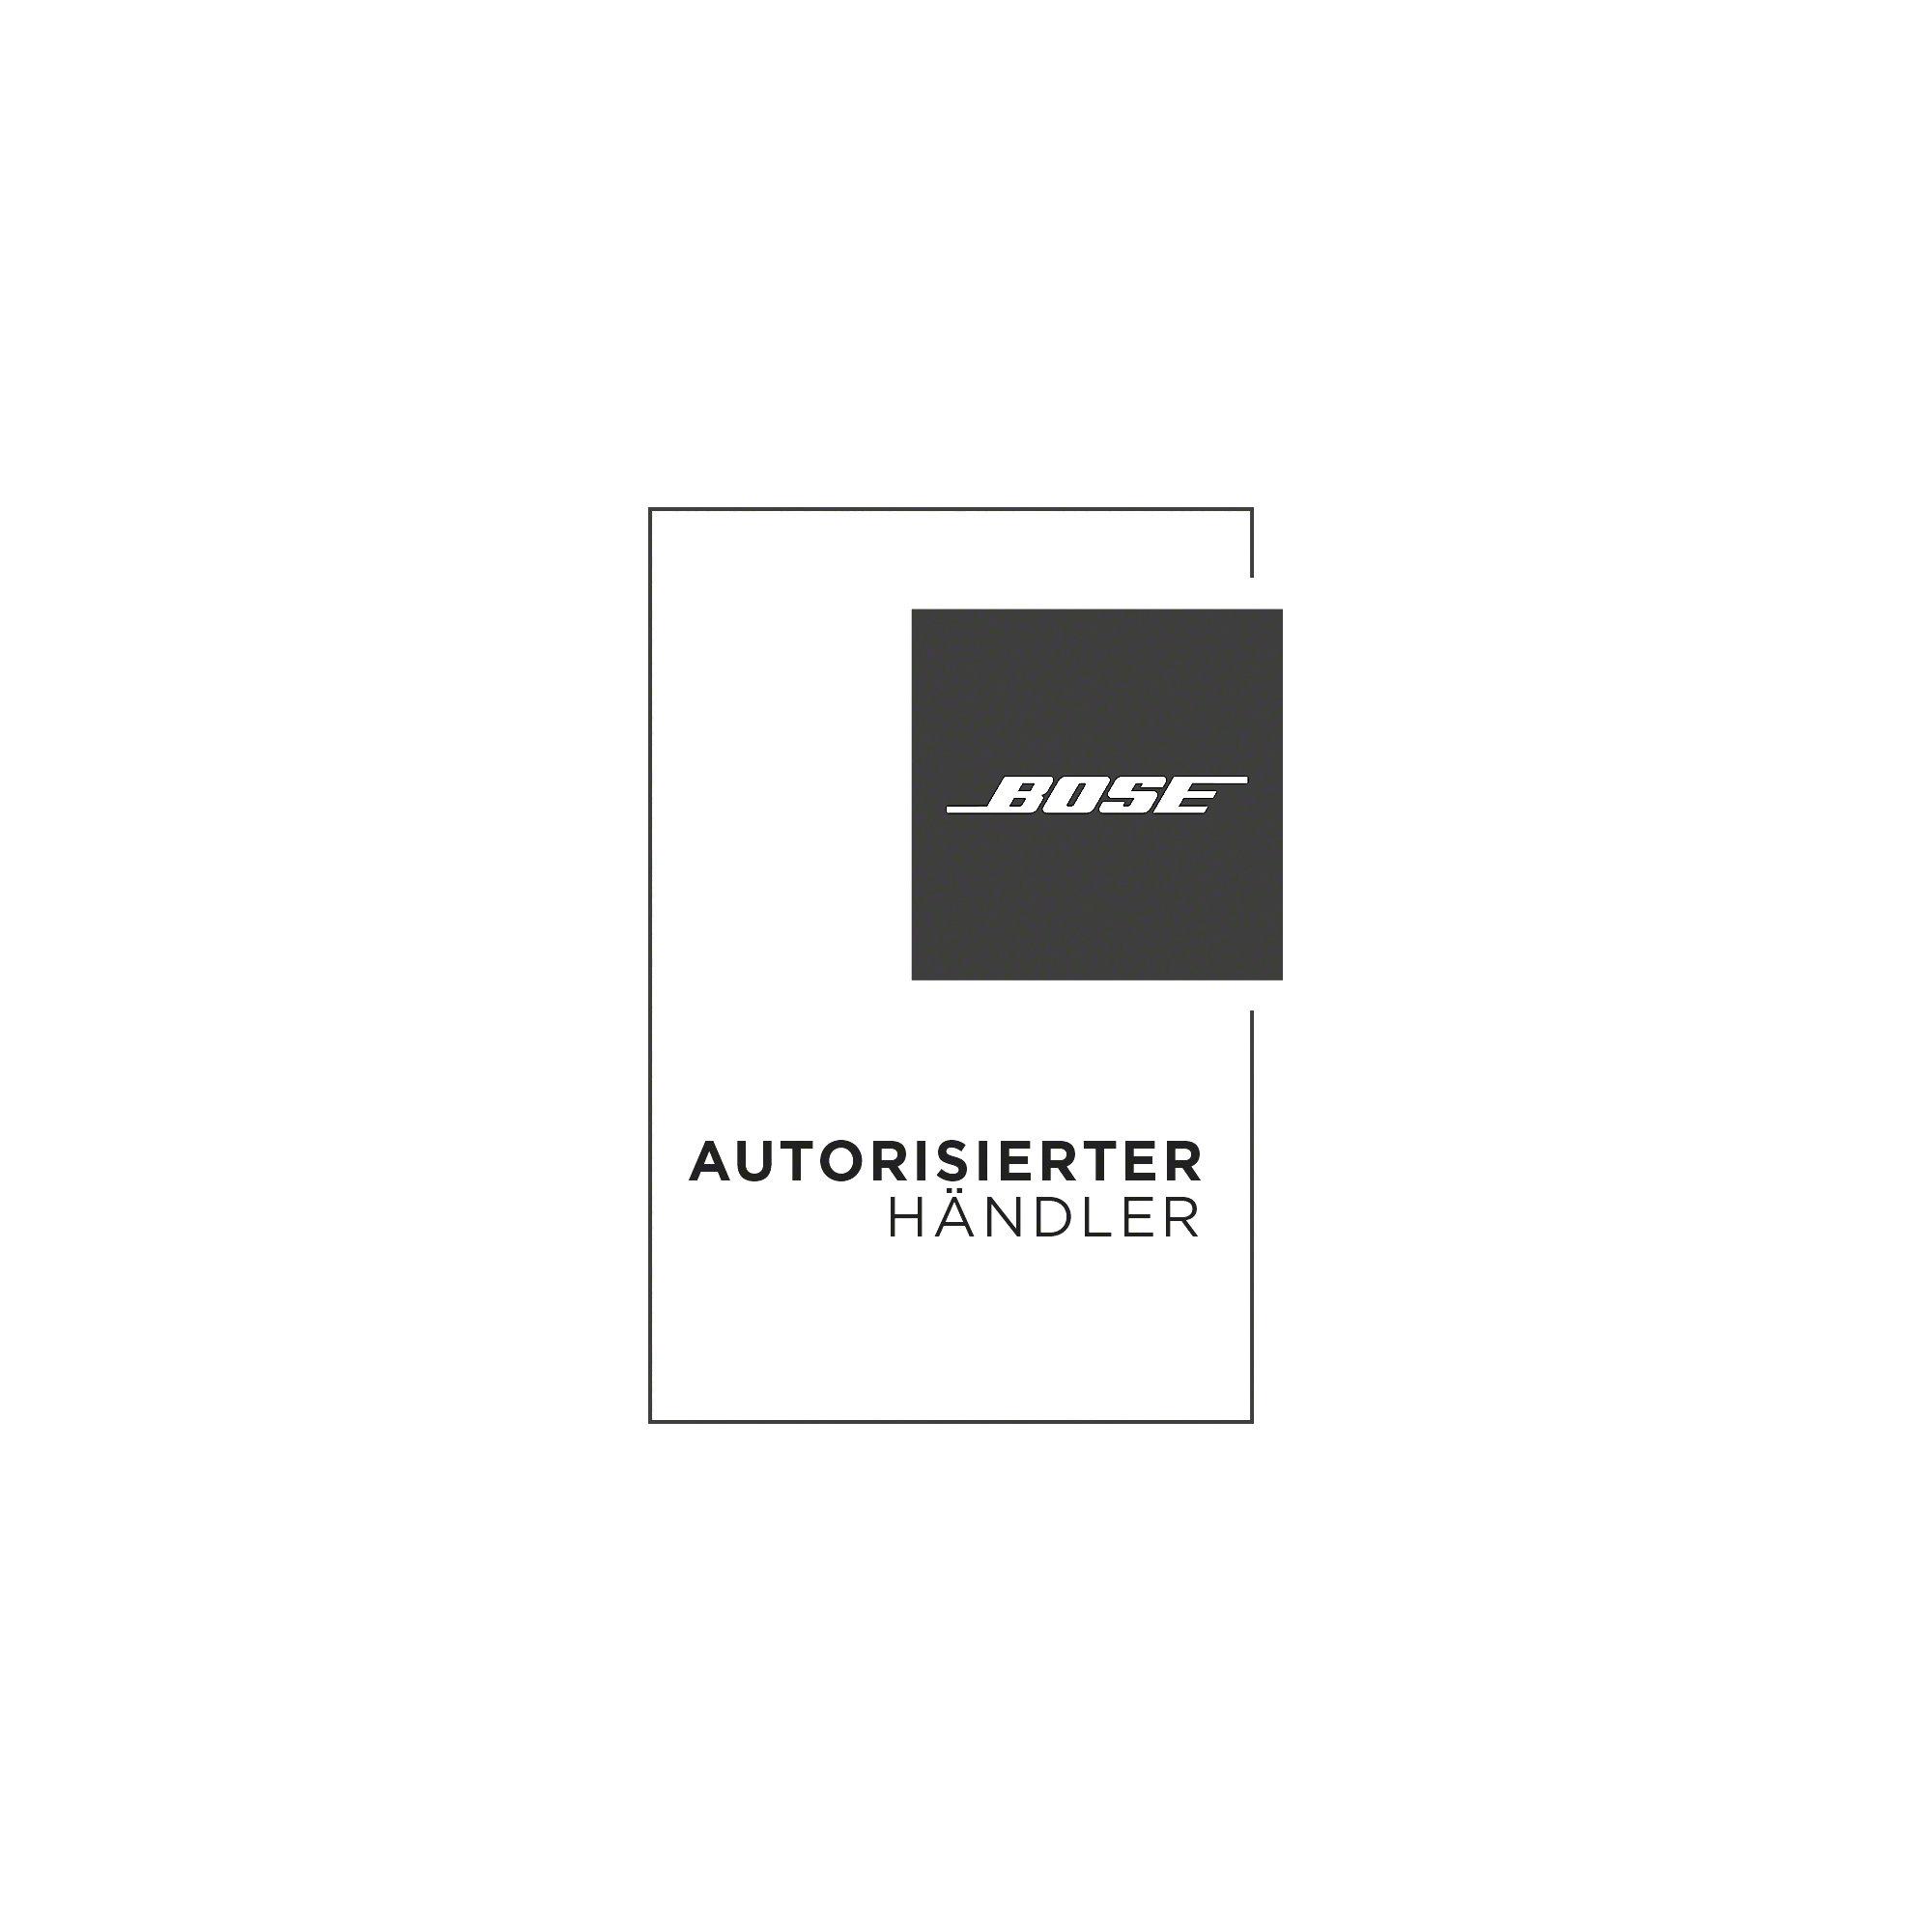 Bose Soundtouch 10 Akku. bose soundtouch 10 test 2018 bose